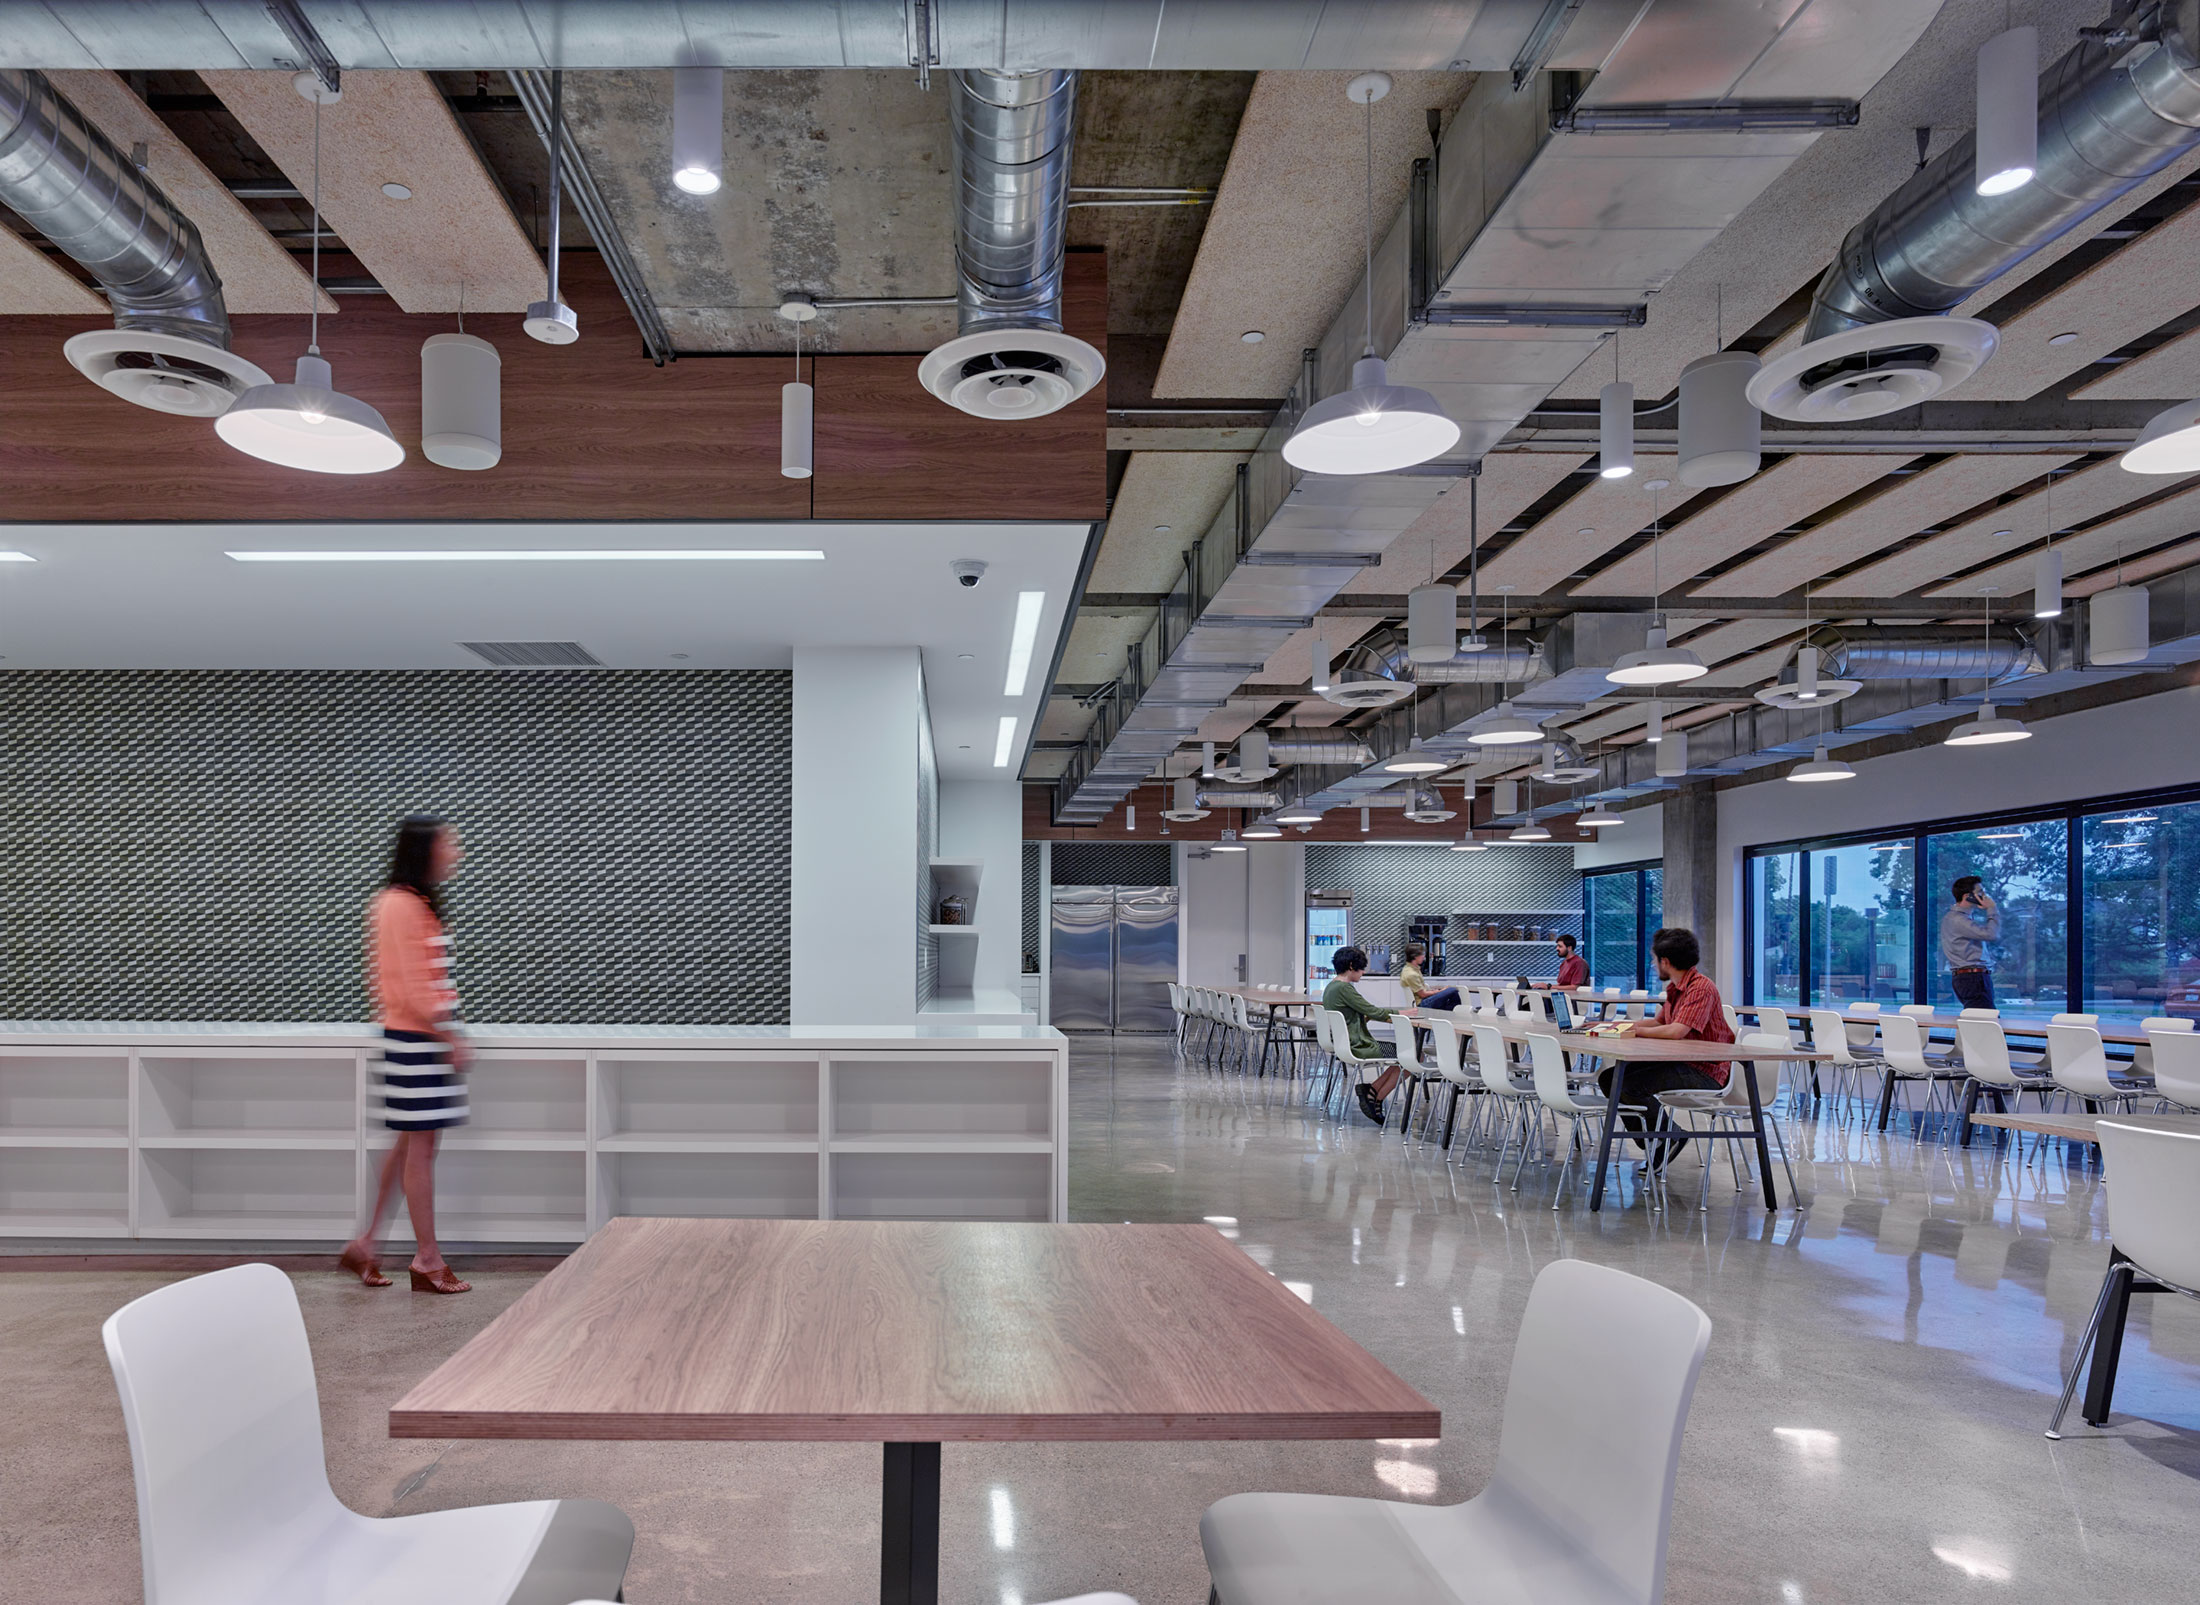 modern-architecture-commercial-interiors-workplace-office-custom-fabrication-california-shubindonaldson-cim-headquarters-07